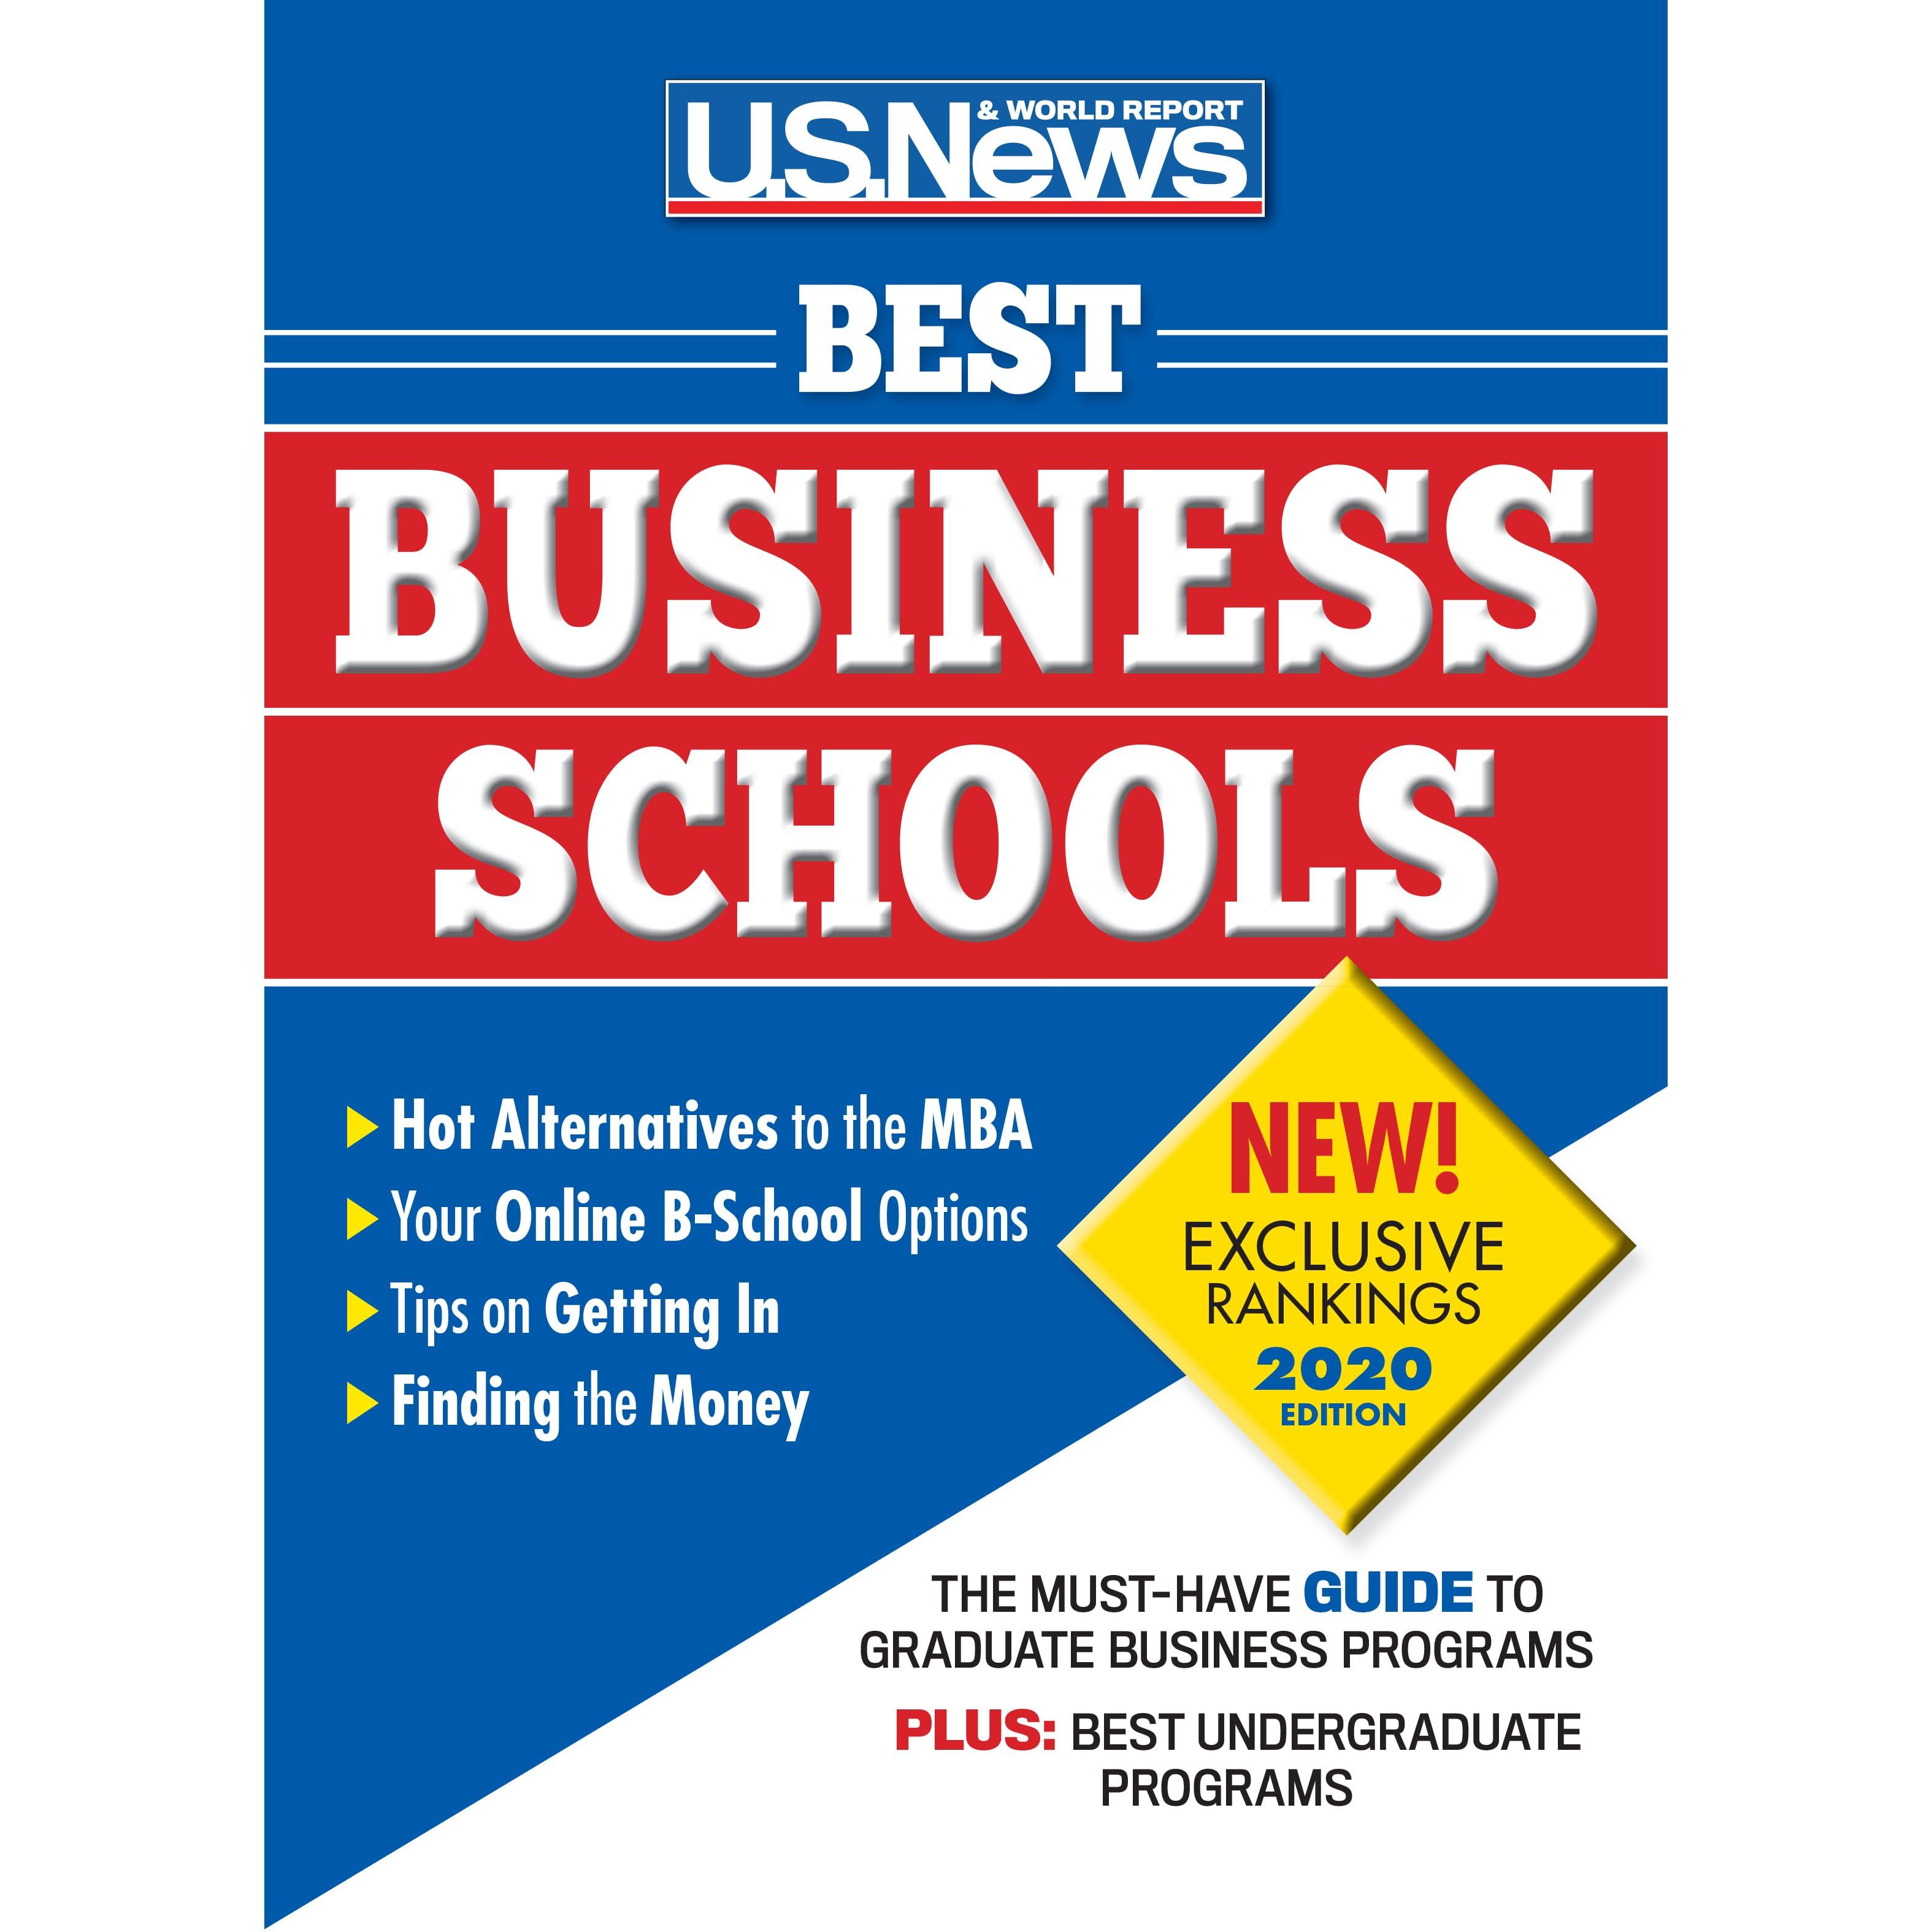 Best Undergraduate Business Schools 2020.Best Business Schools 2020 By U S News And World Report